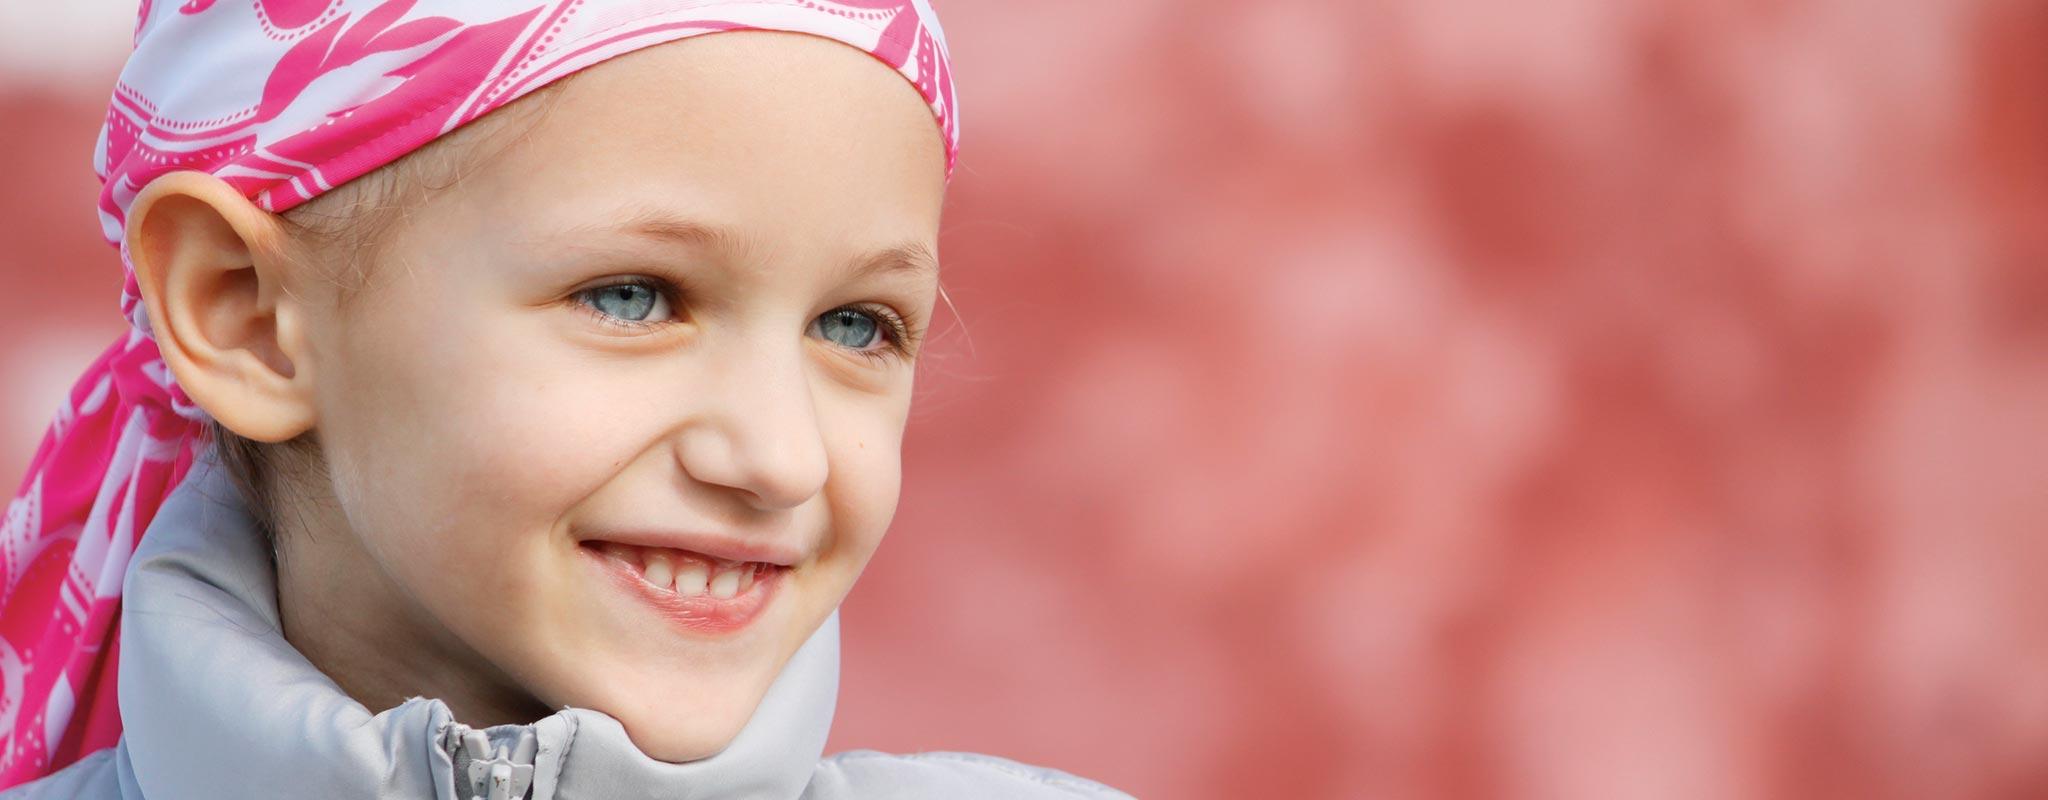 childre valley childrens cancer - HD2048×800